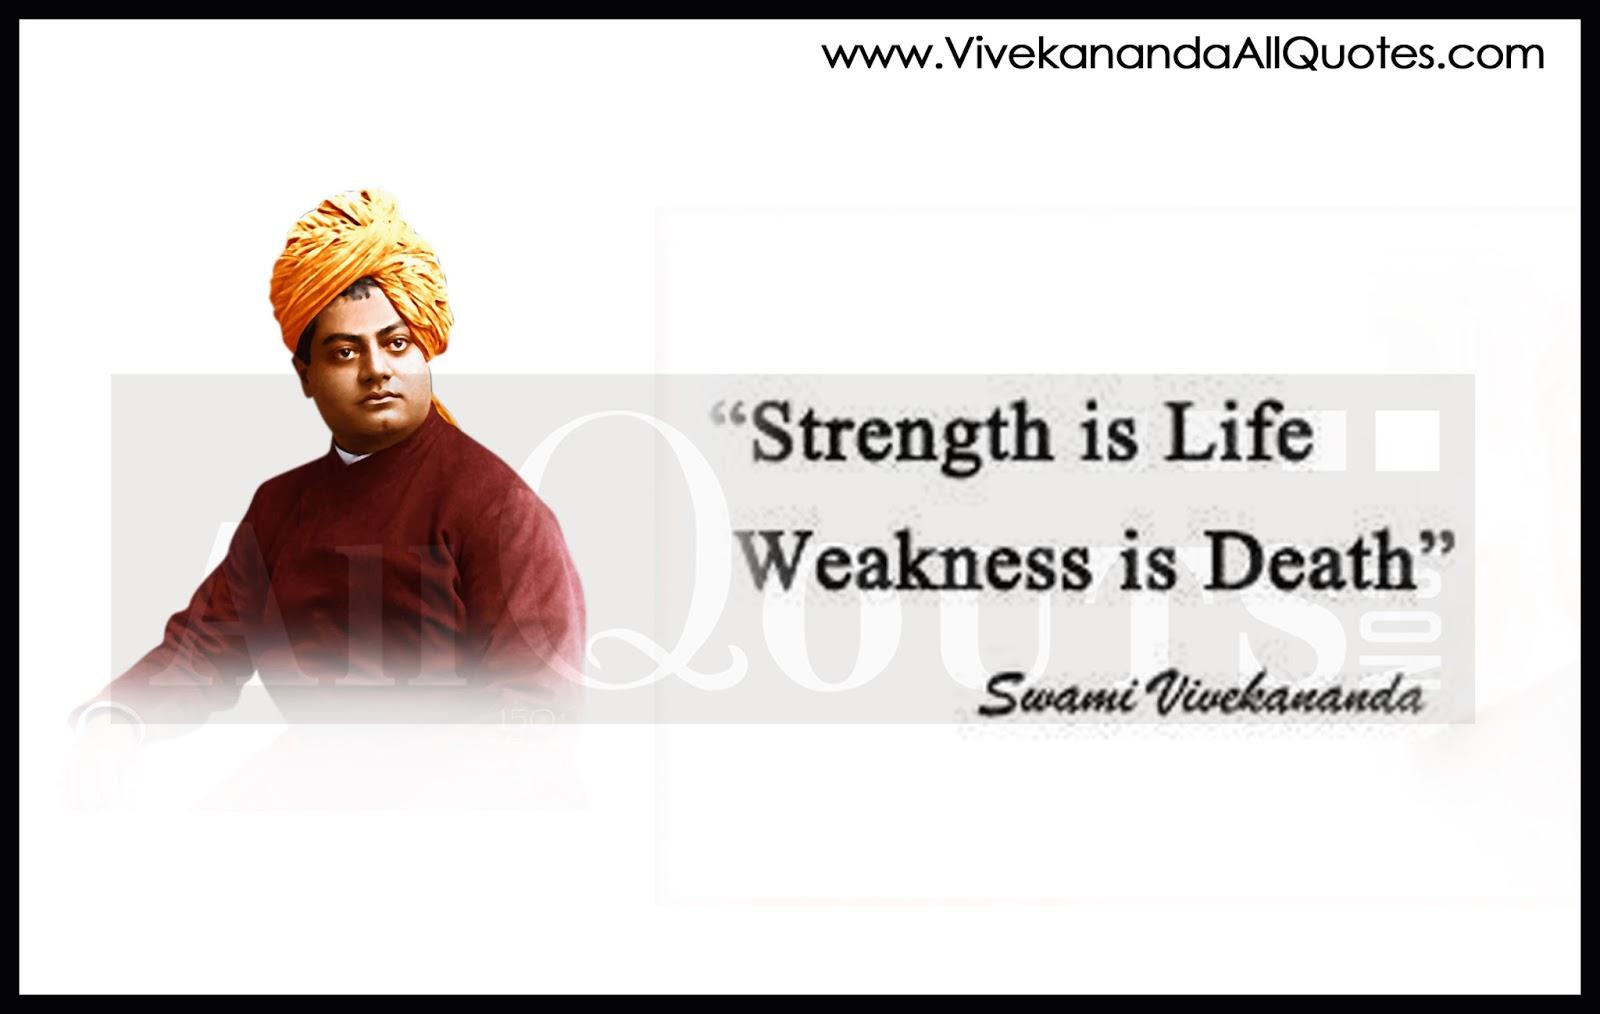 Swami Vivekananda Hd Wallpaper - Swami Vivekananda , HD Wallpaper & Backgrounds